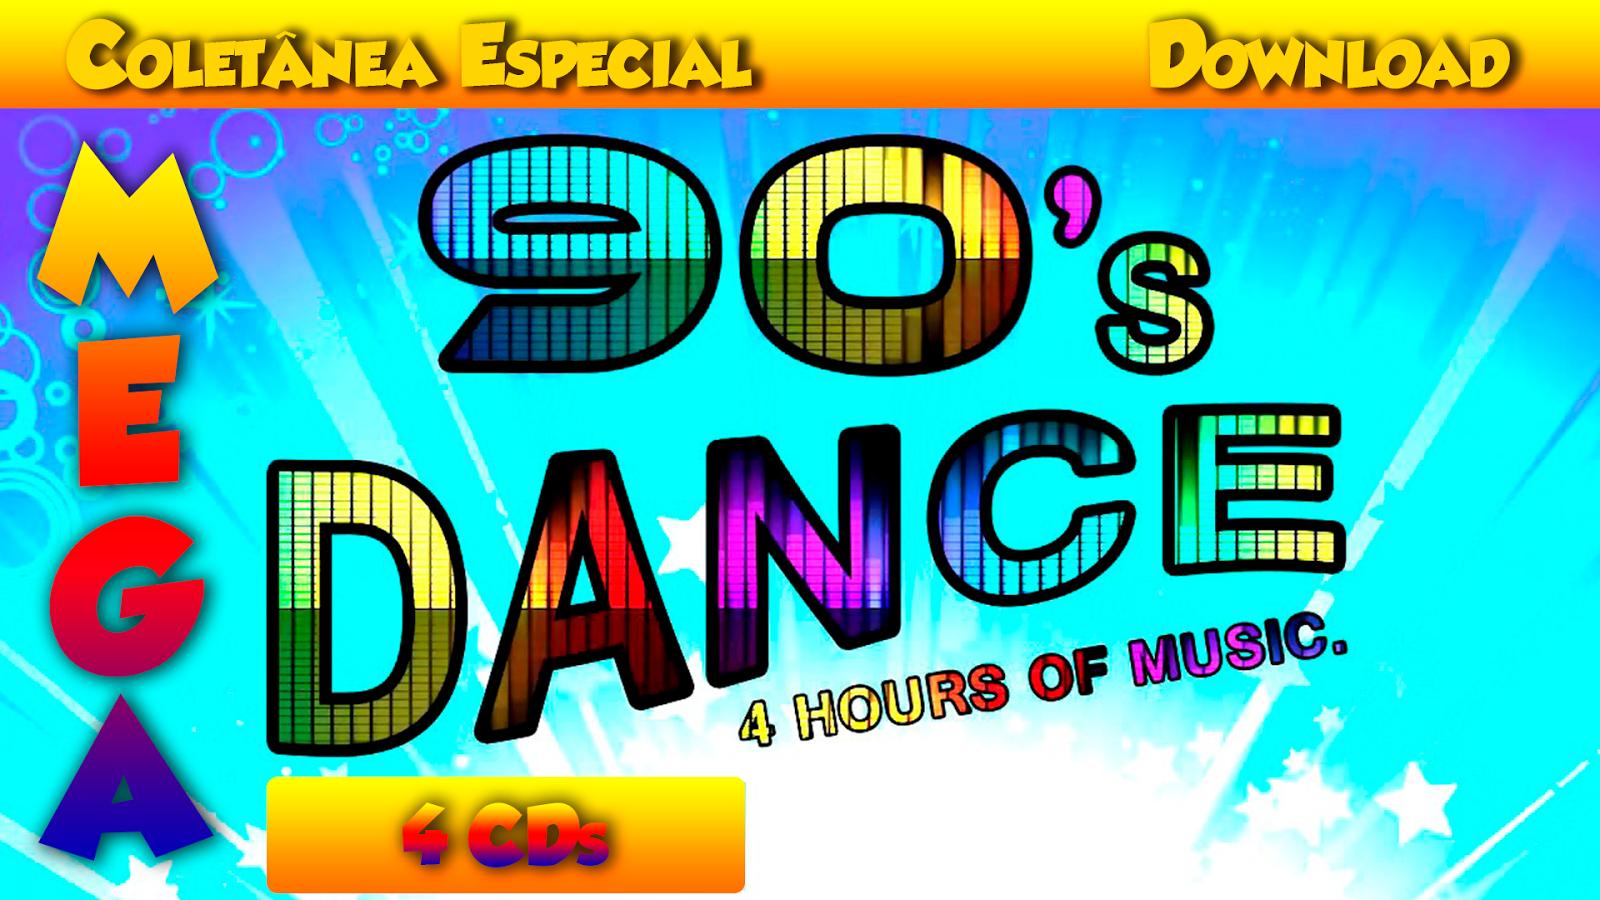 BAIXAR - 4 CDs COLETÂNEA MEGA DANCE ANOS 90 ~ SIDNEY MUSIC